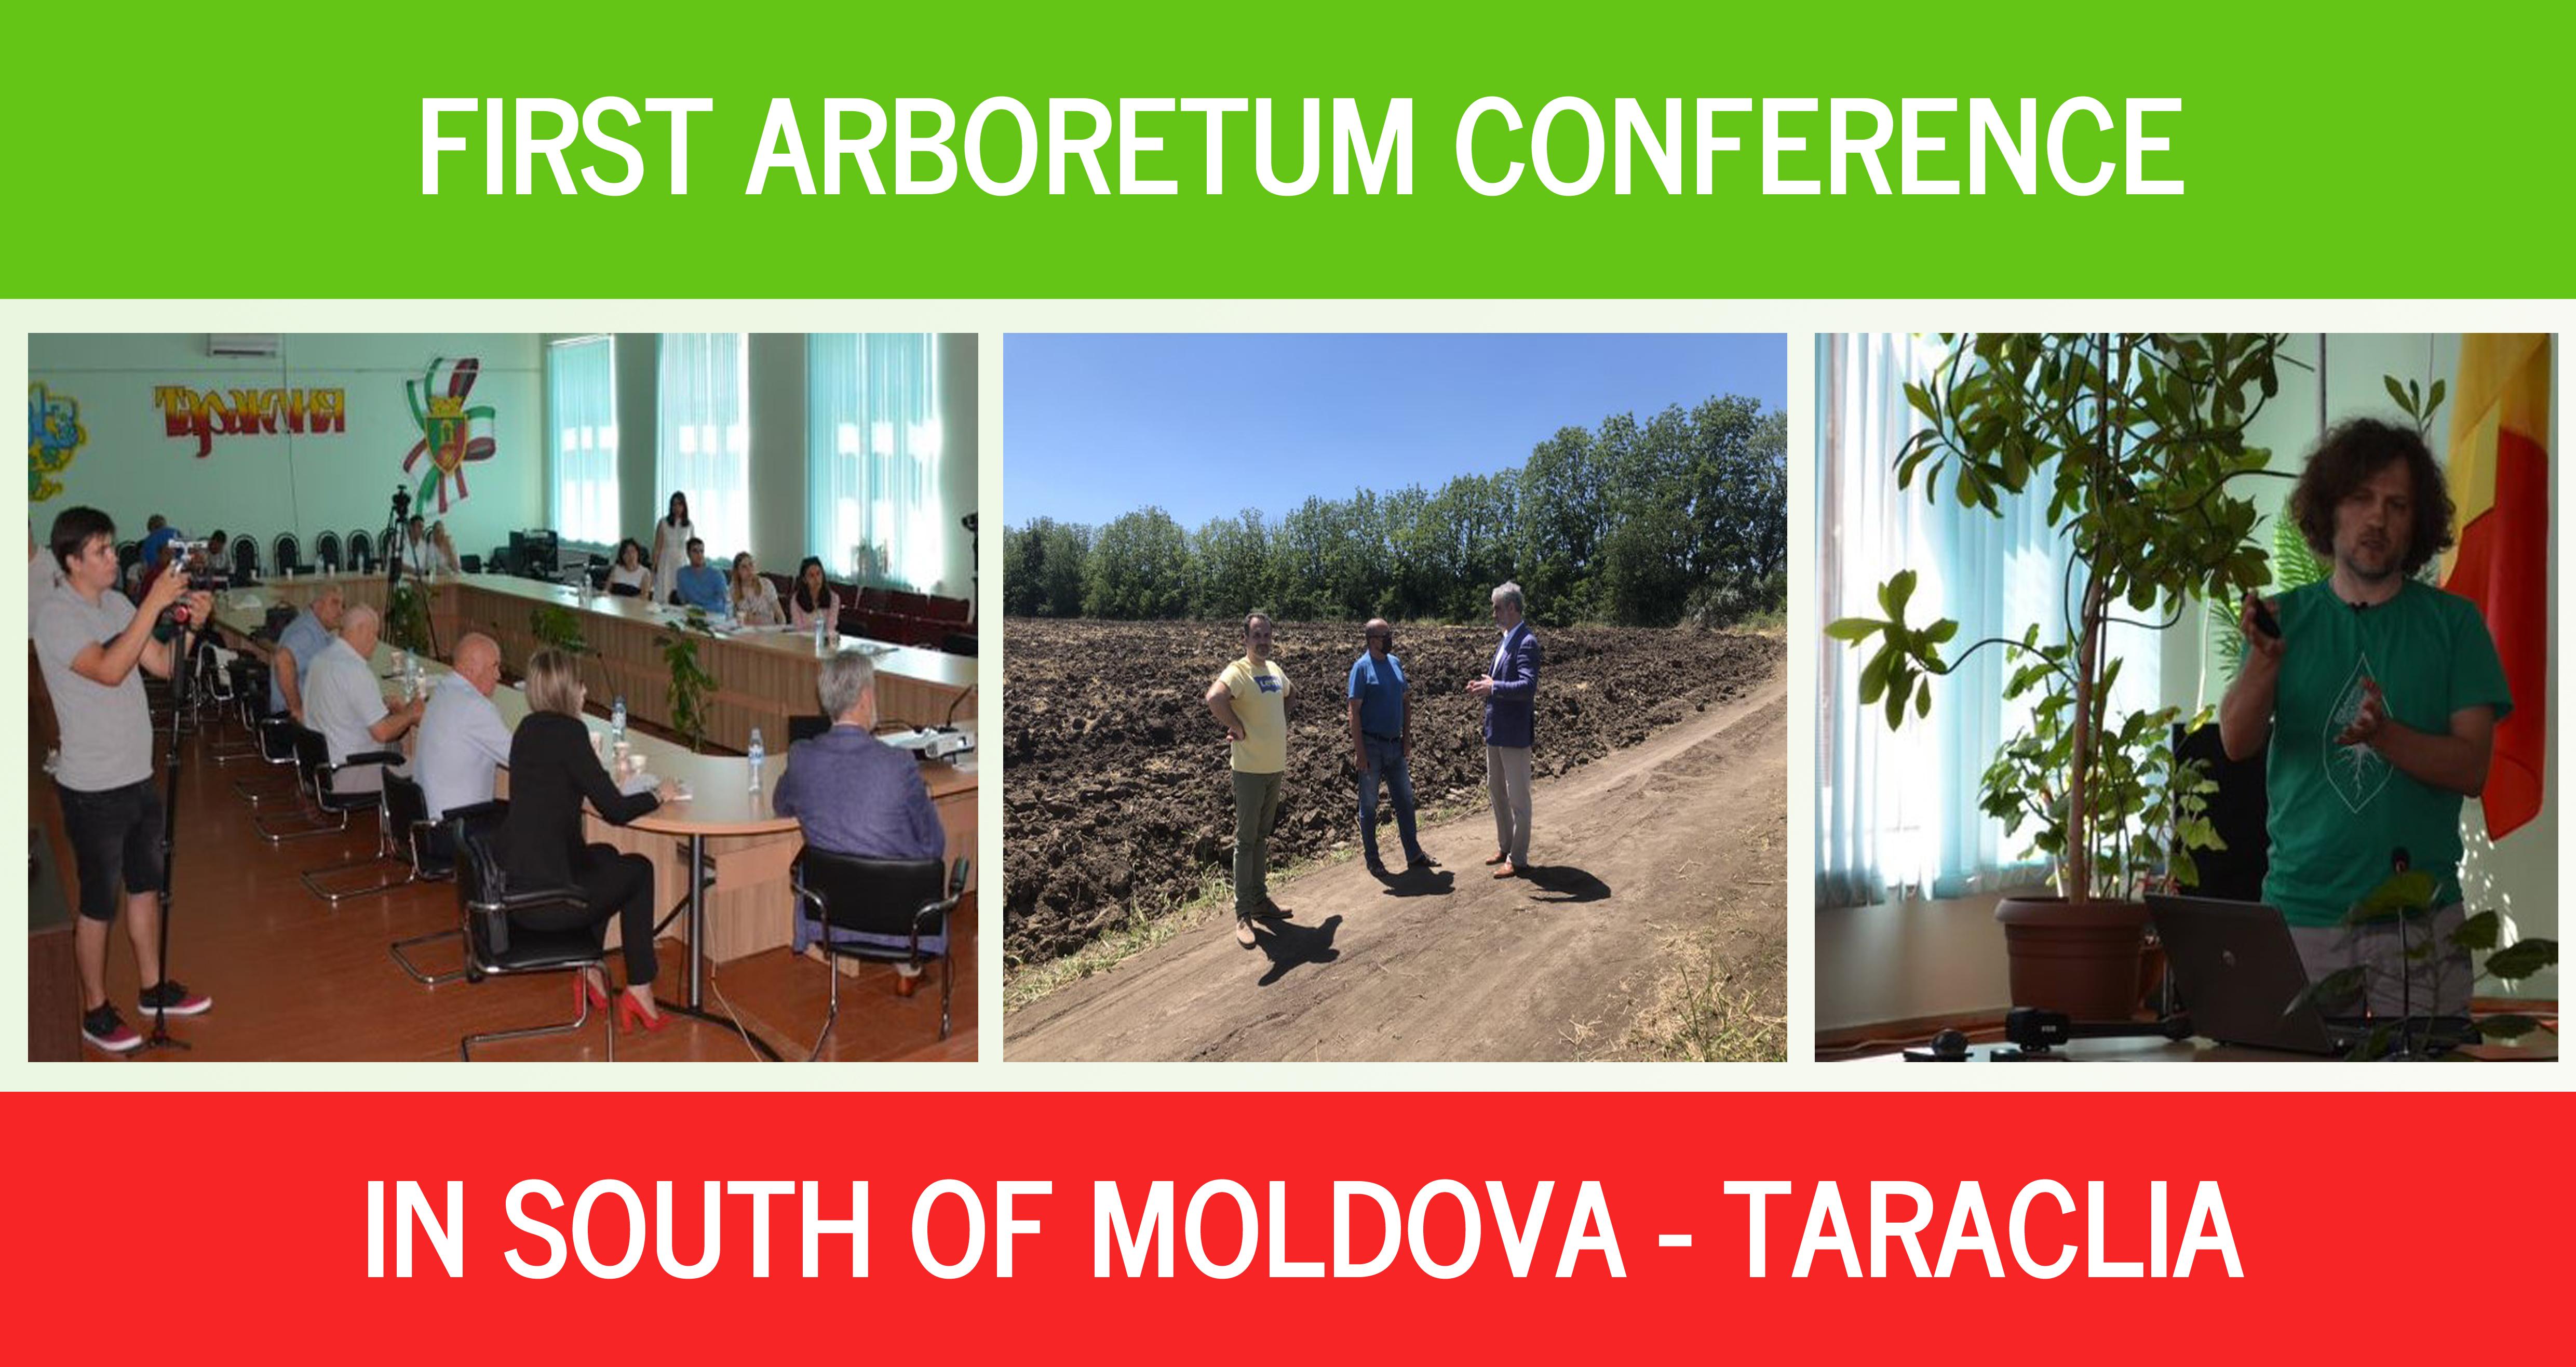 Our first presentation at Taraclia